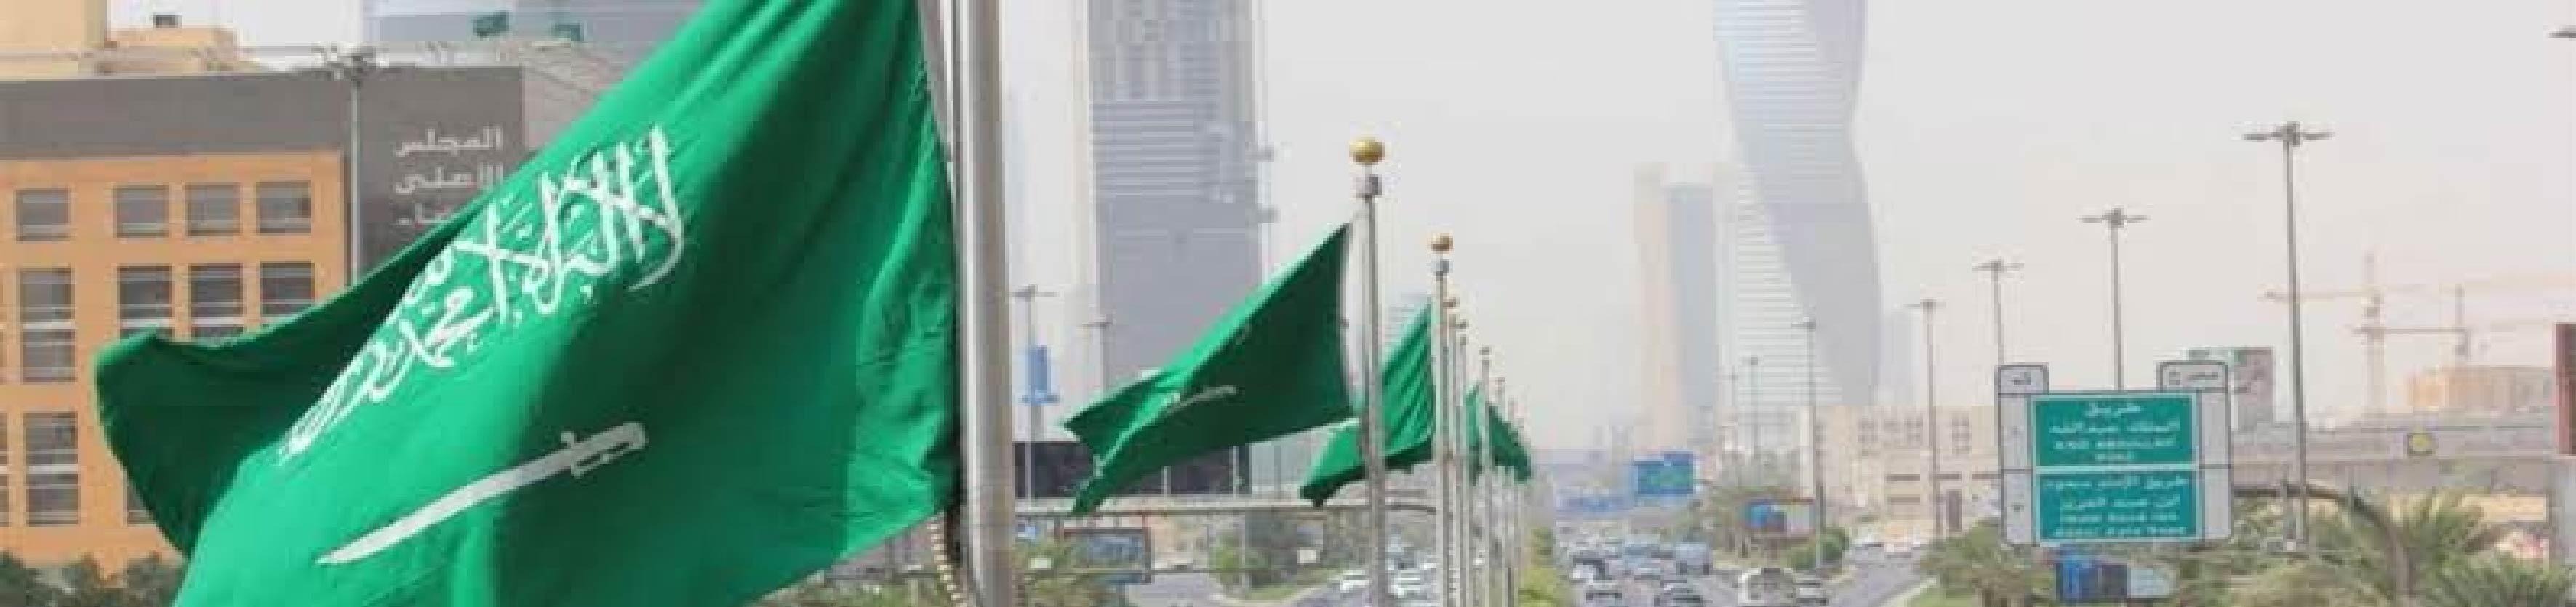 Saudi Universities: Top 7 Universities In The Arabian Kingdom